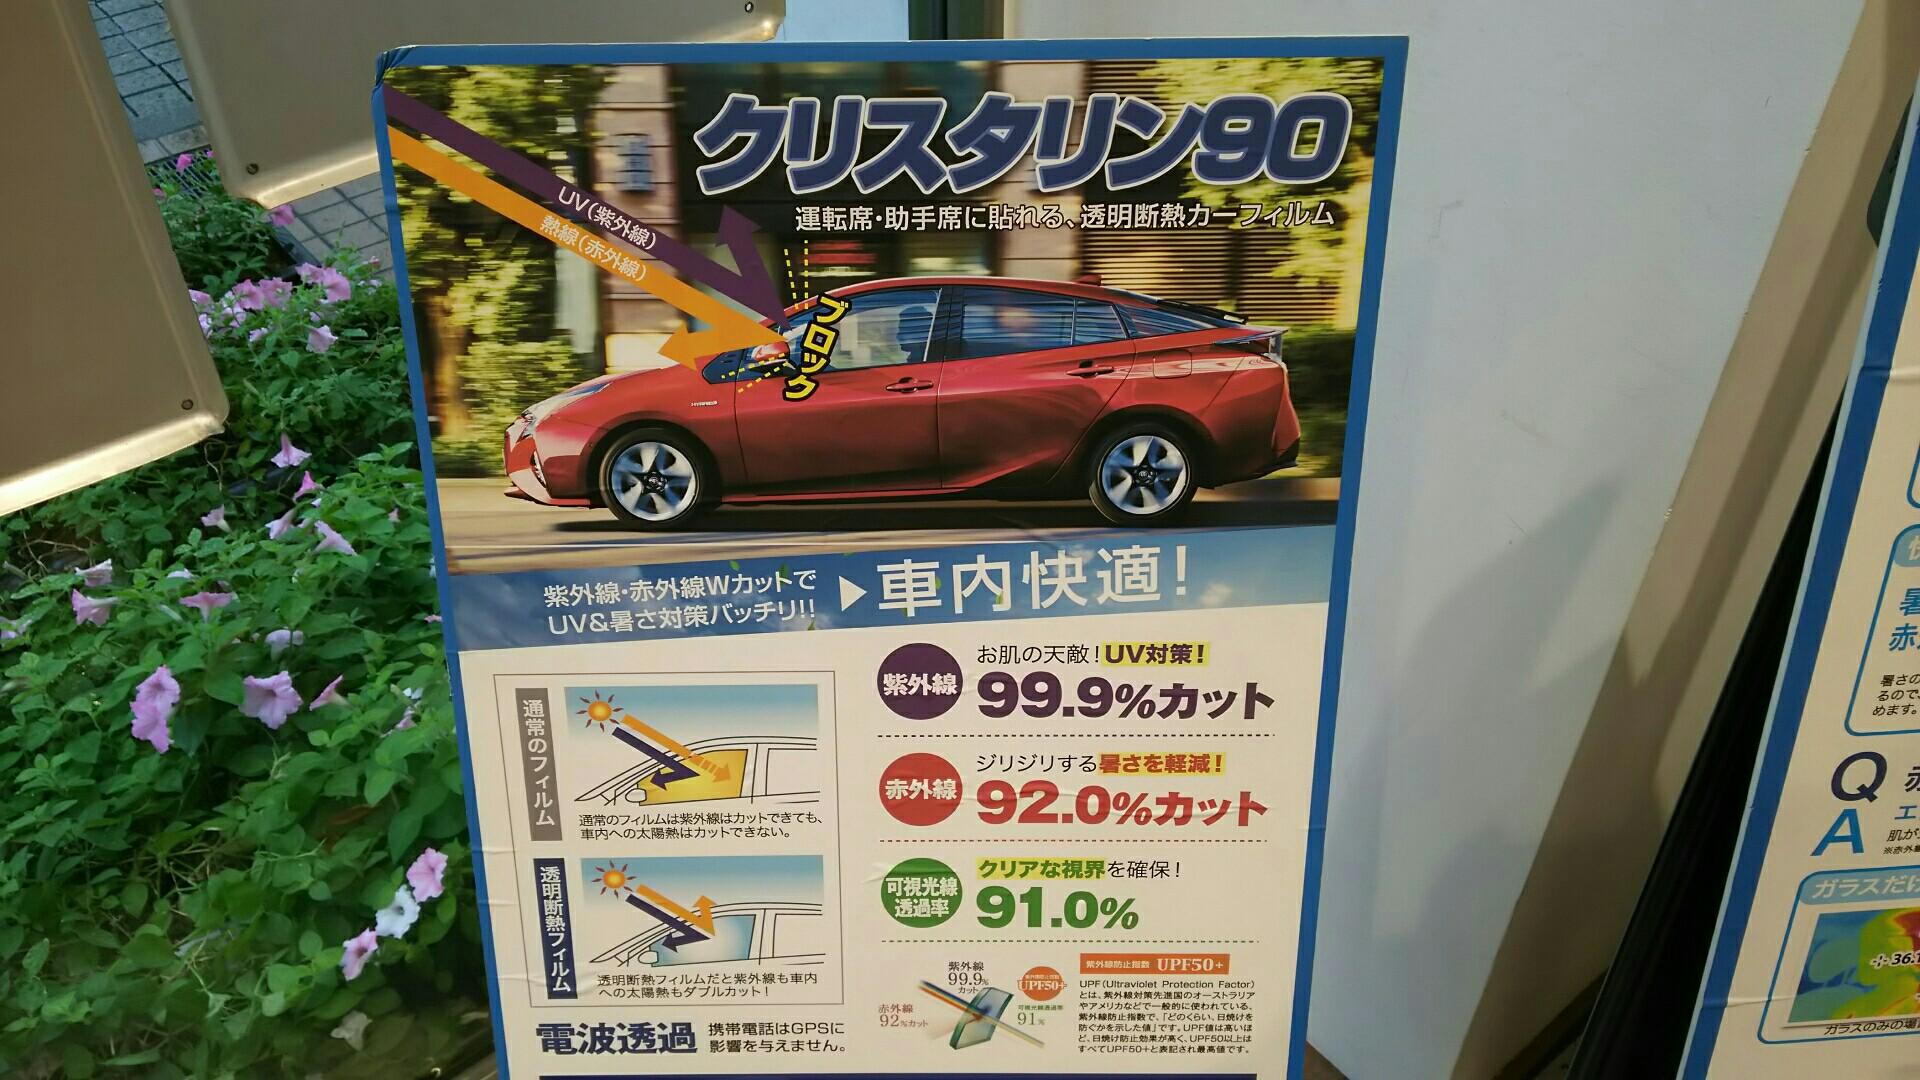 3M / スリーエム ジャパン スコッチティント オートフィルム クリスタリン90